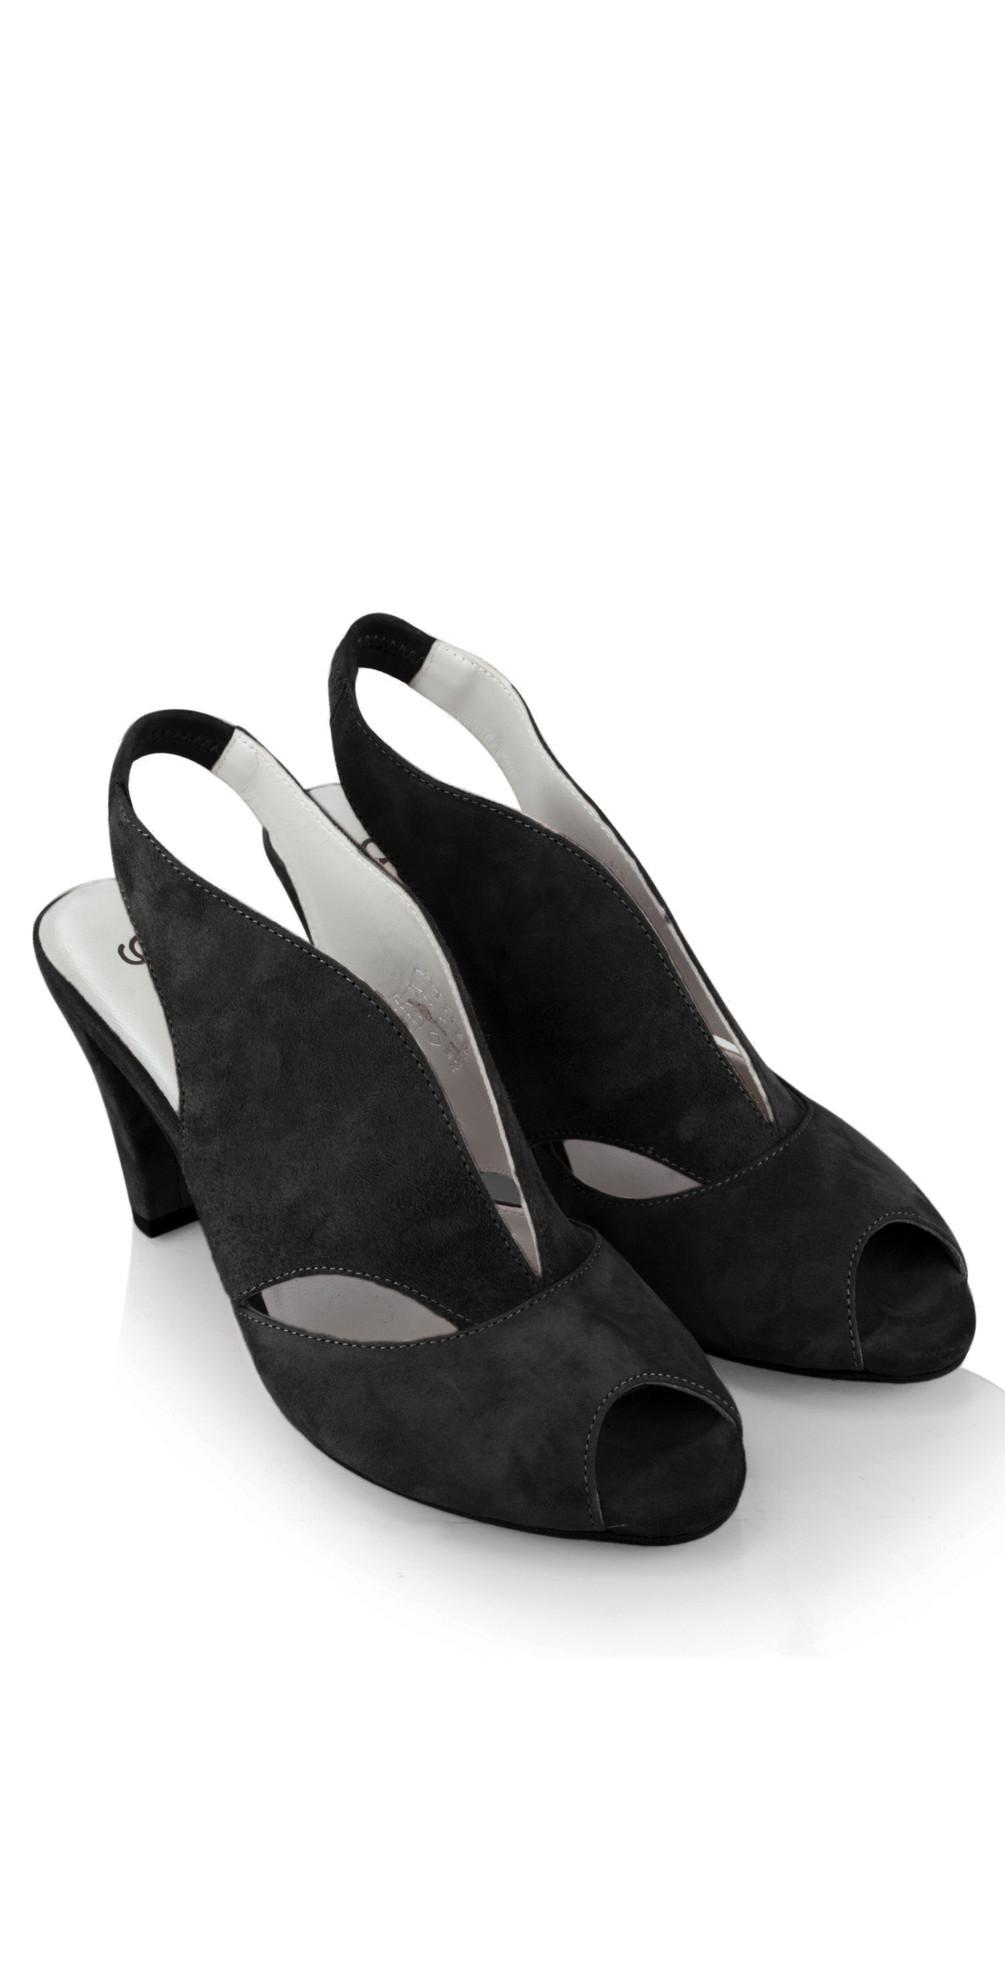 Valencia Black Suede  Sandal Shoe main image